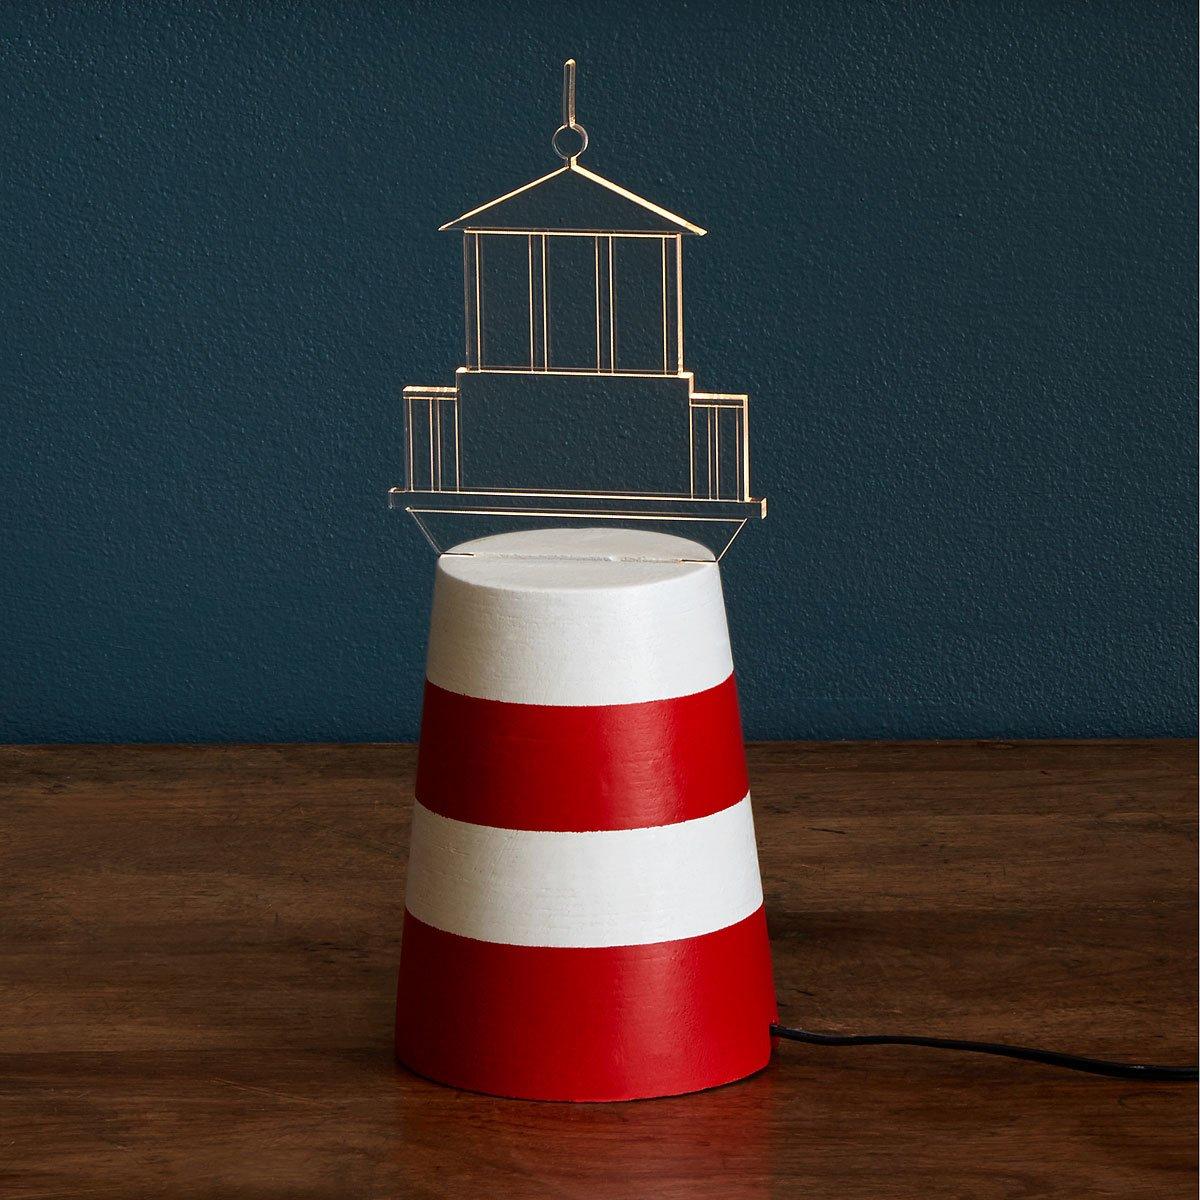 Cottage lighthouse lamp 3 colors - Led Lighthouse Lamp 1 Thumbnail Led Lighthouse Lamp Lighthouse Decor Led Lighting Uncommongoods